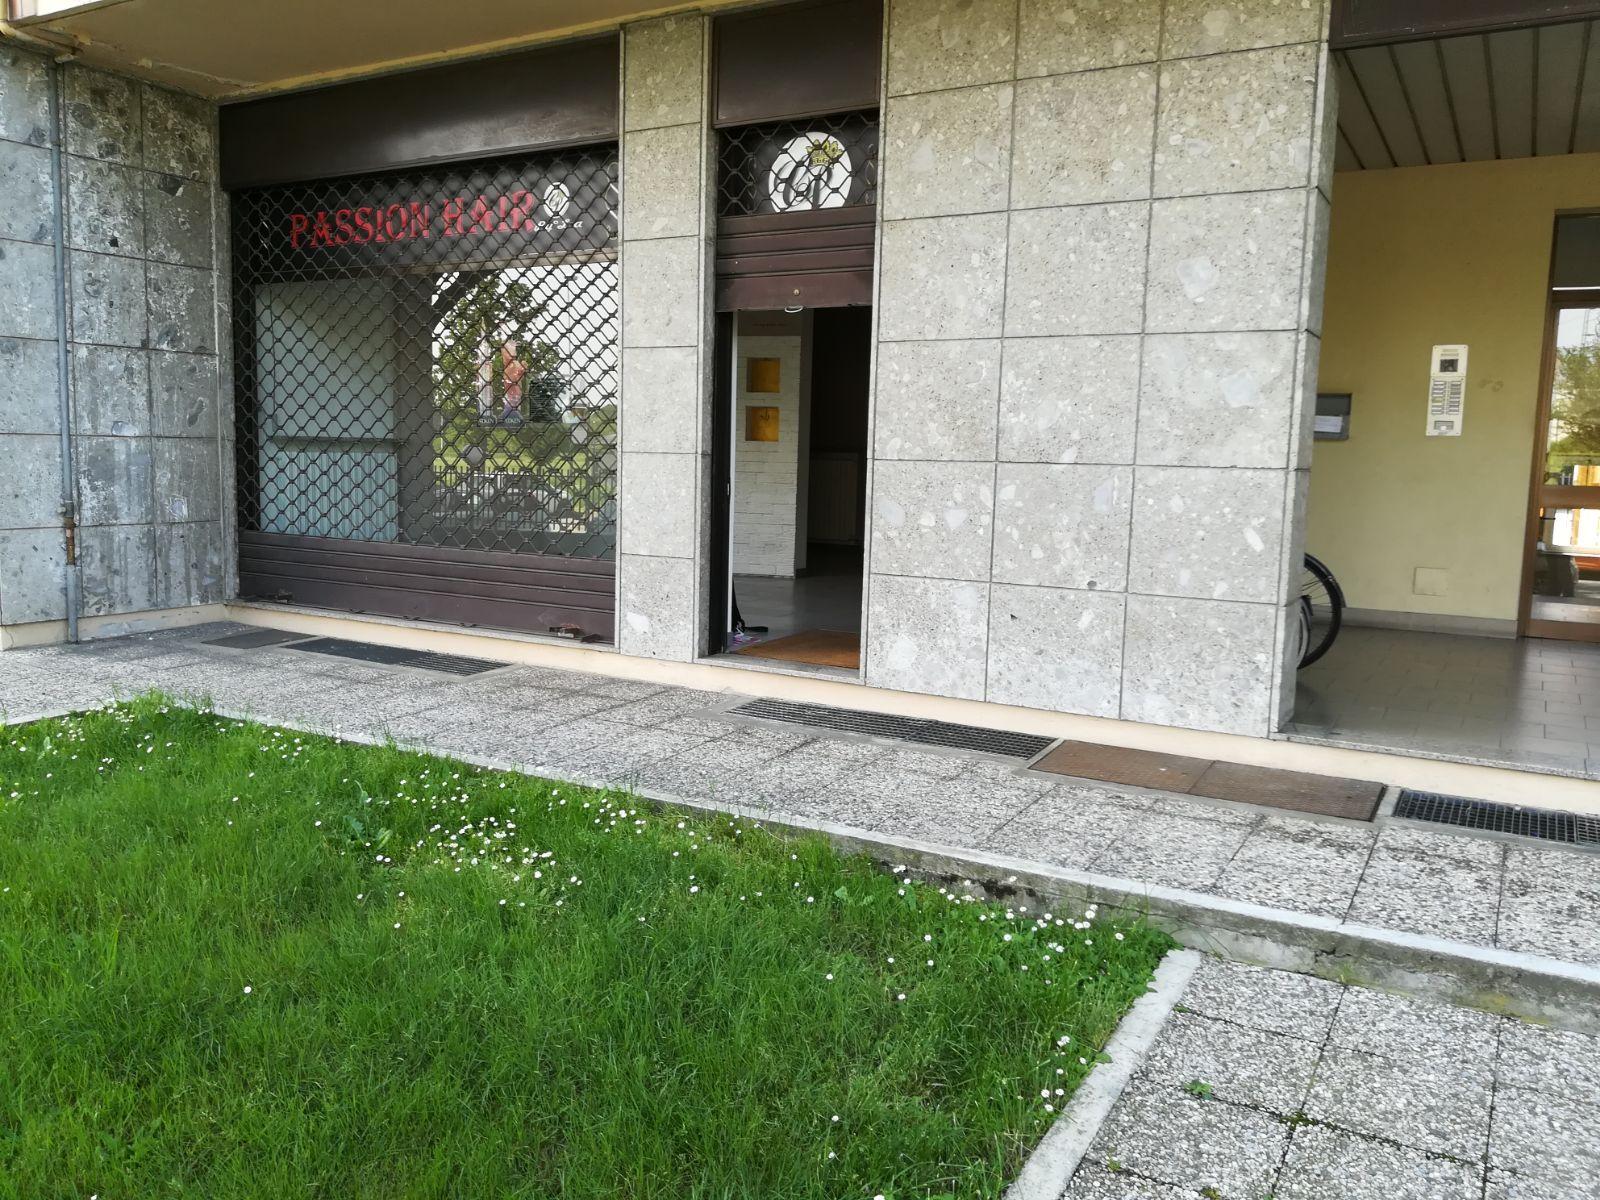 FONDO COMMERCIALE in Affitto a S.Antonio - S. Andrea, Novara (NOVARA)